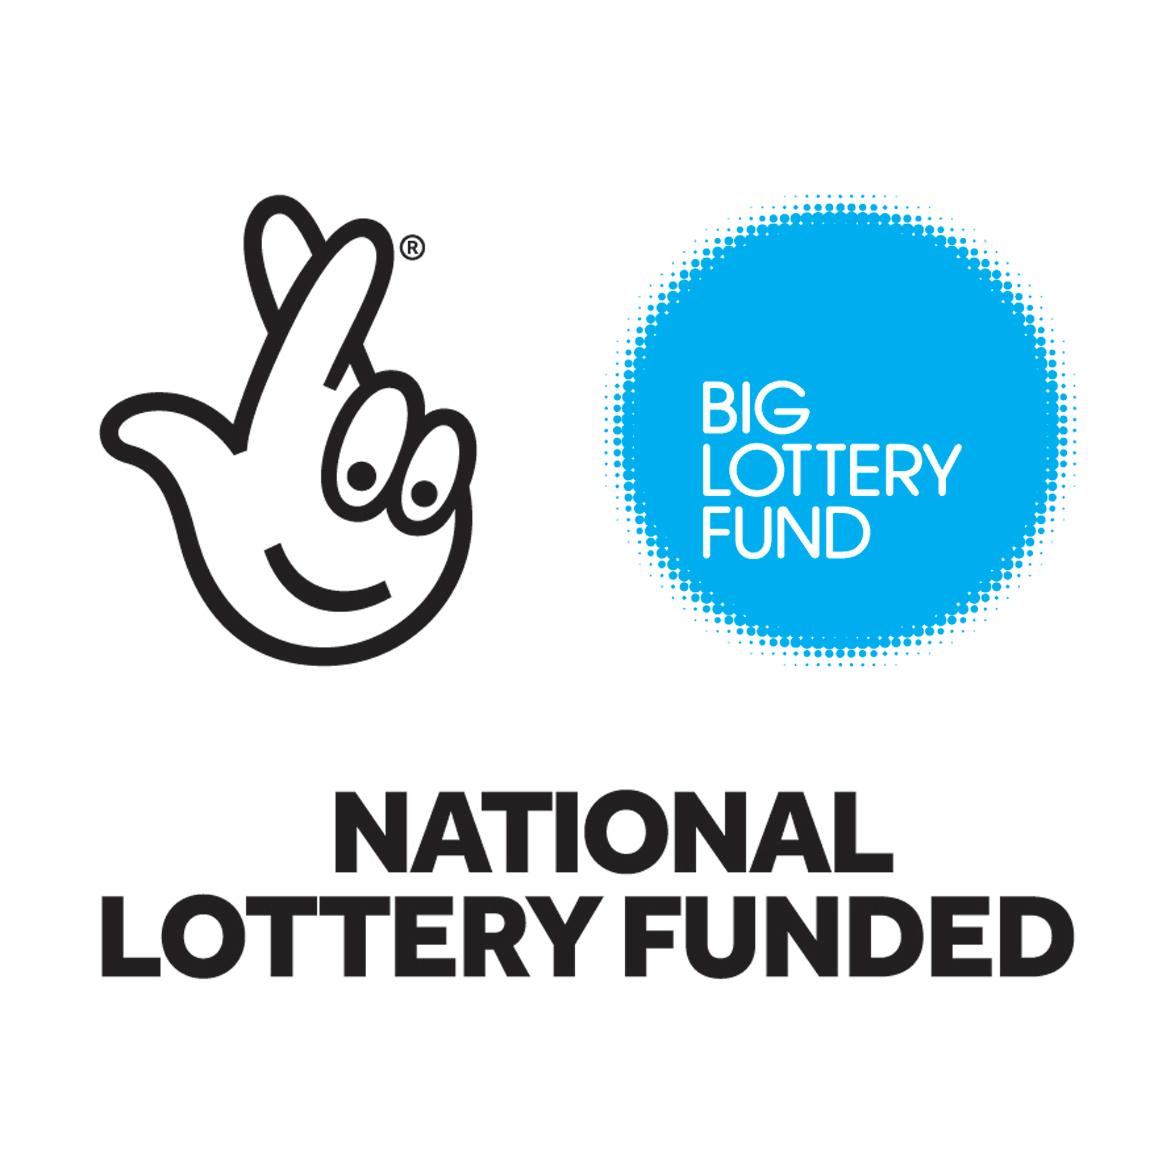 Big lottery Fund blue-large.jpg